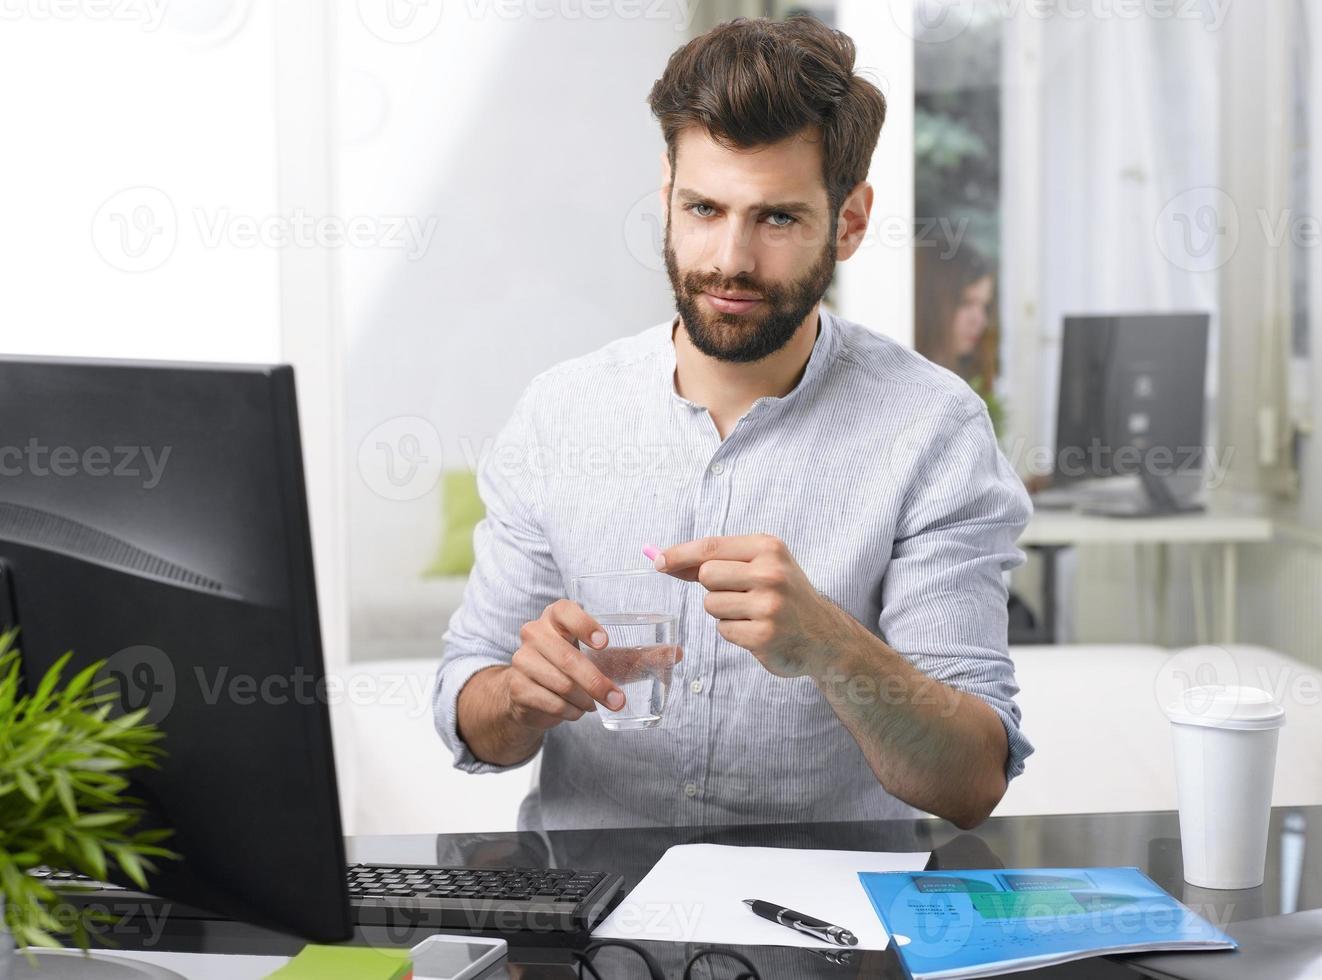 beklemtoonde zakenman foto